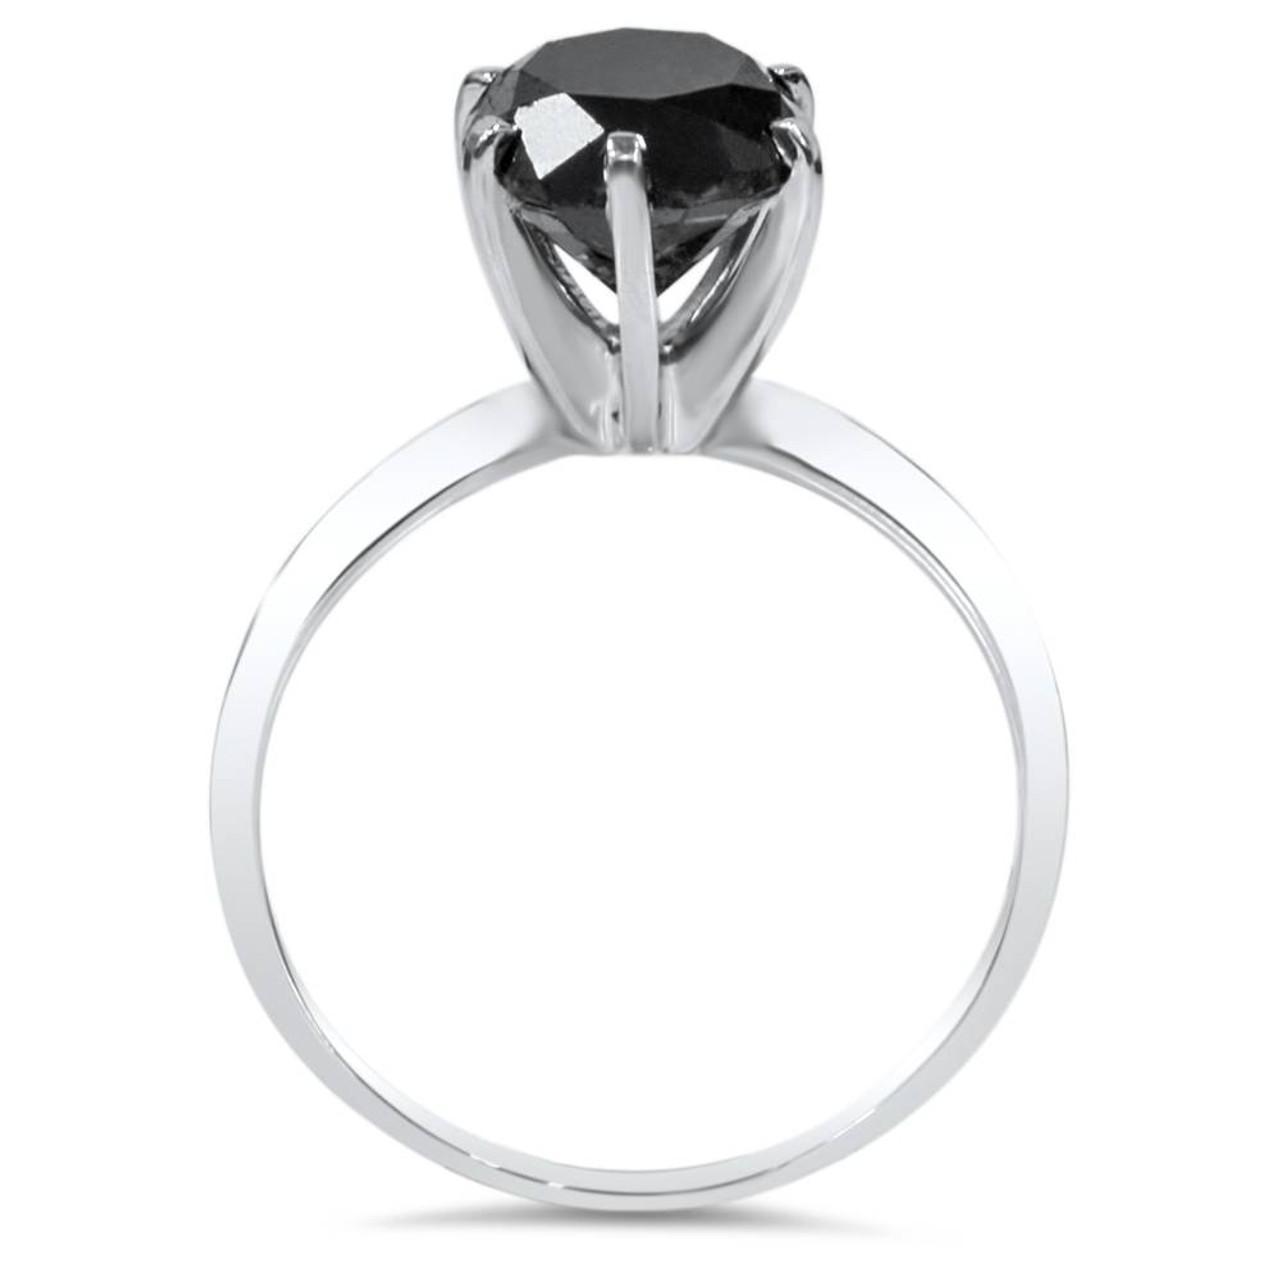 98f870c7165a1 1ct Black Diamond Solitaire Engagement Ring 14K White Gold (Black, )